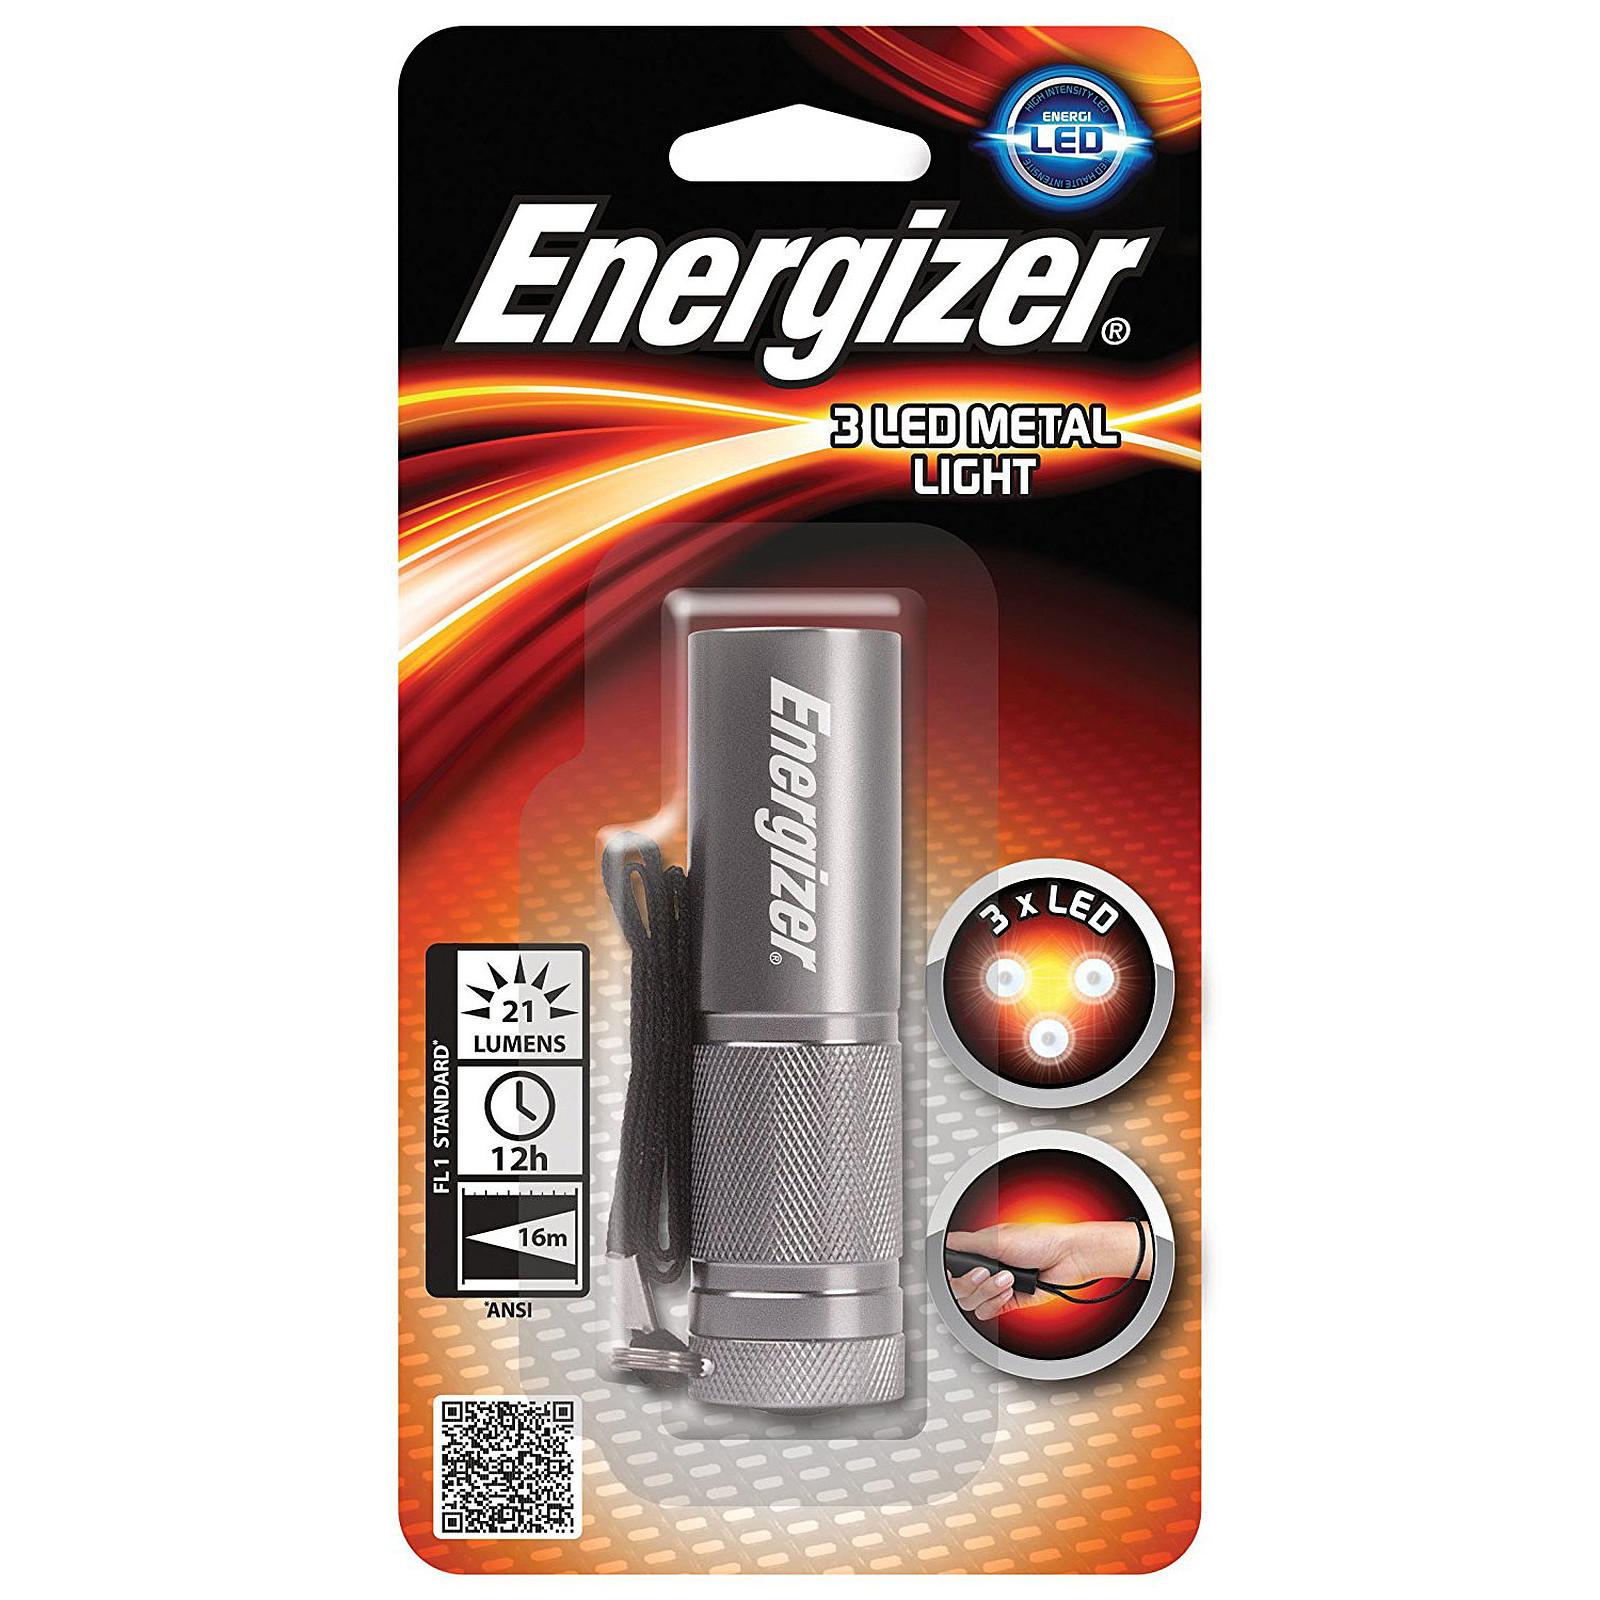 Energizer 3 LED Metal Light